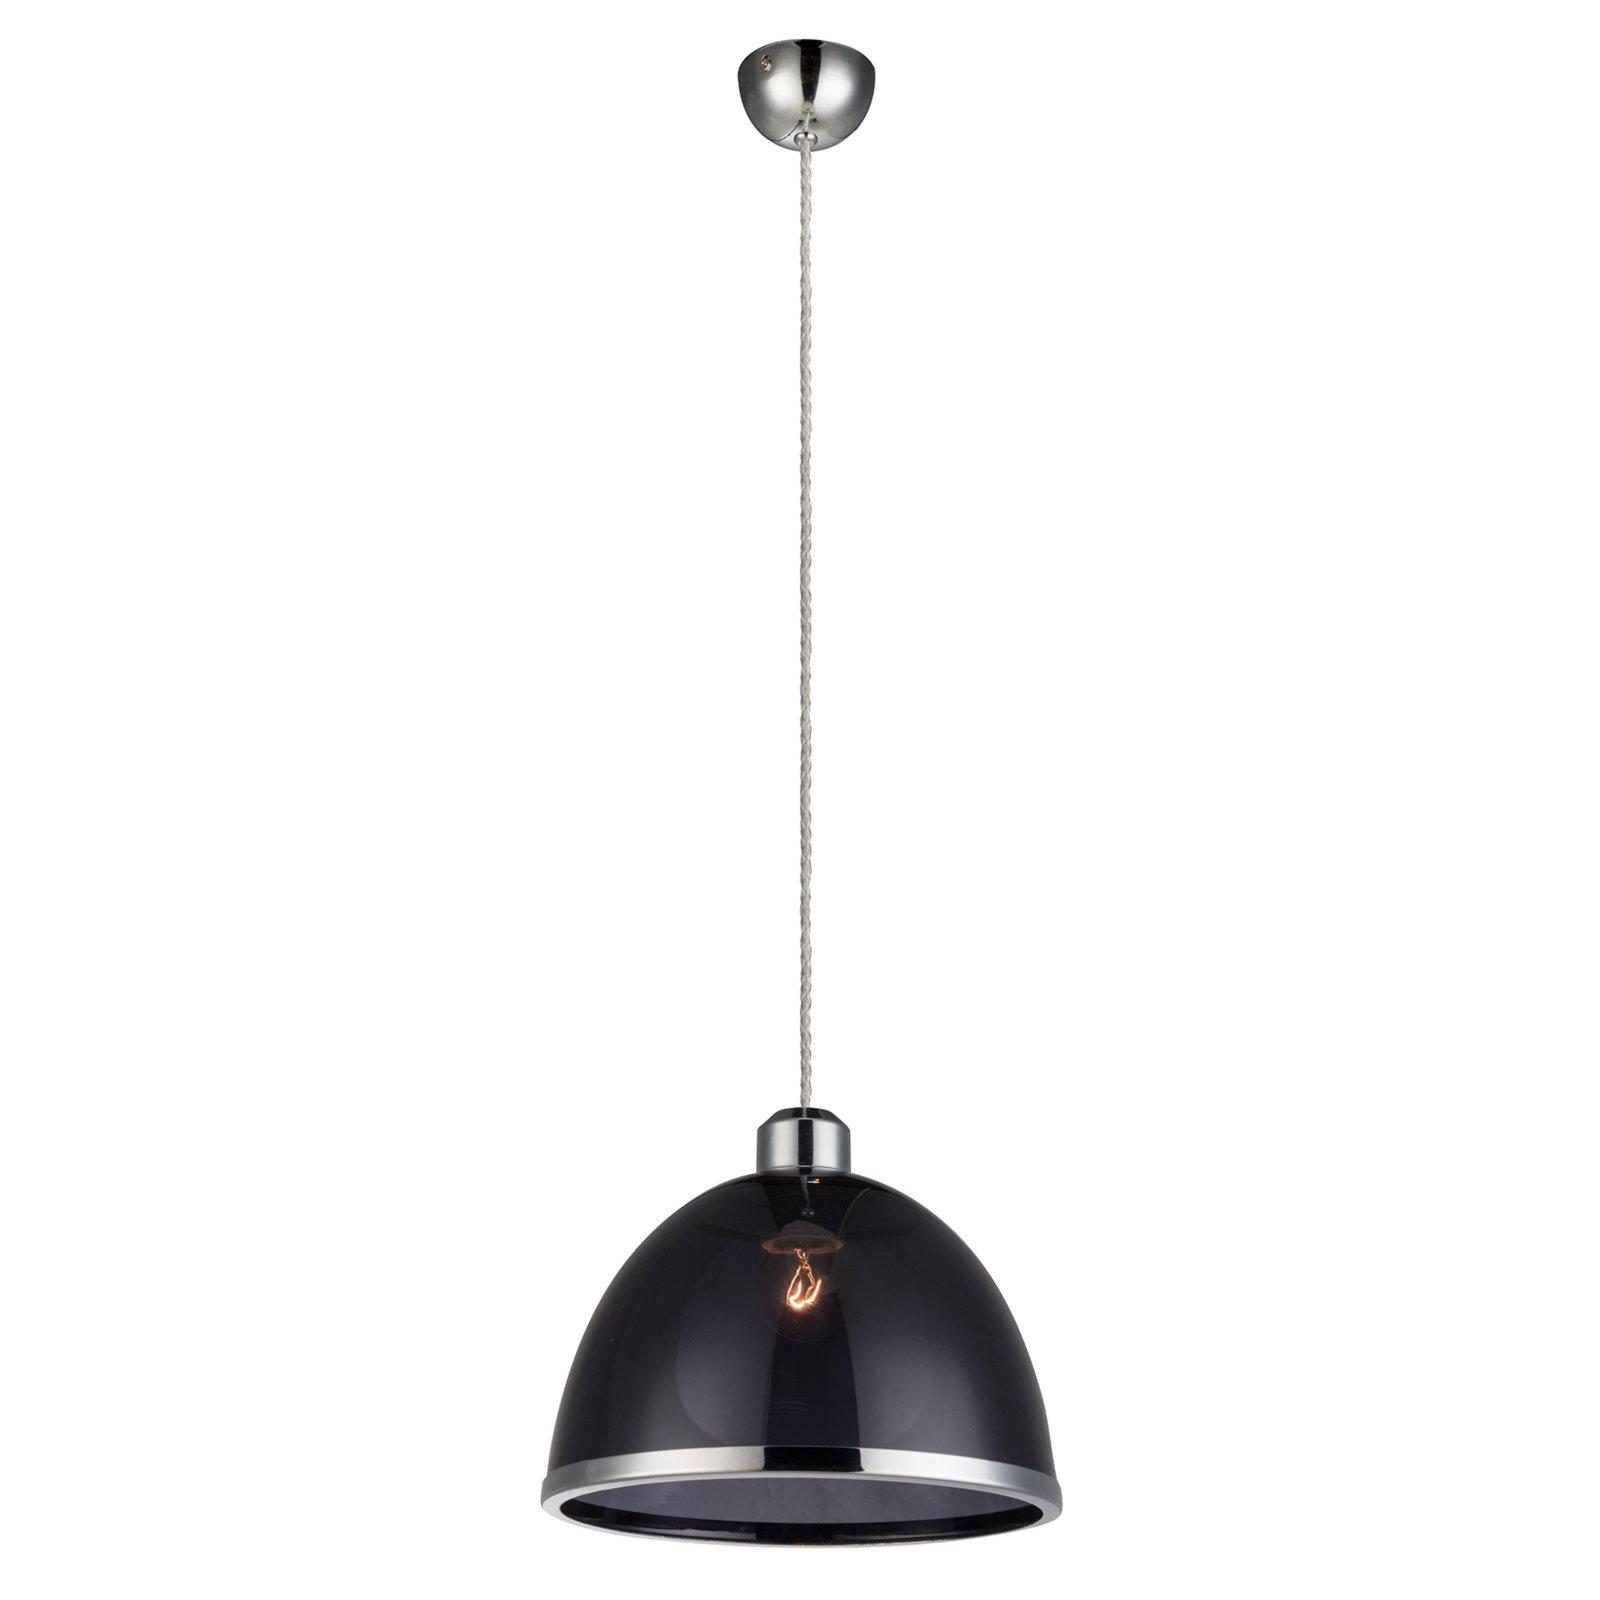 pendelleuchte schwarz nickel matt acryl pendelleuchten lampen m bel m belhaus roller. Black Bedroom Furniture Sets. Home Design Ideas